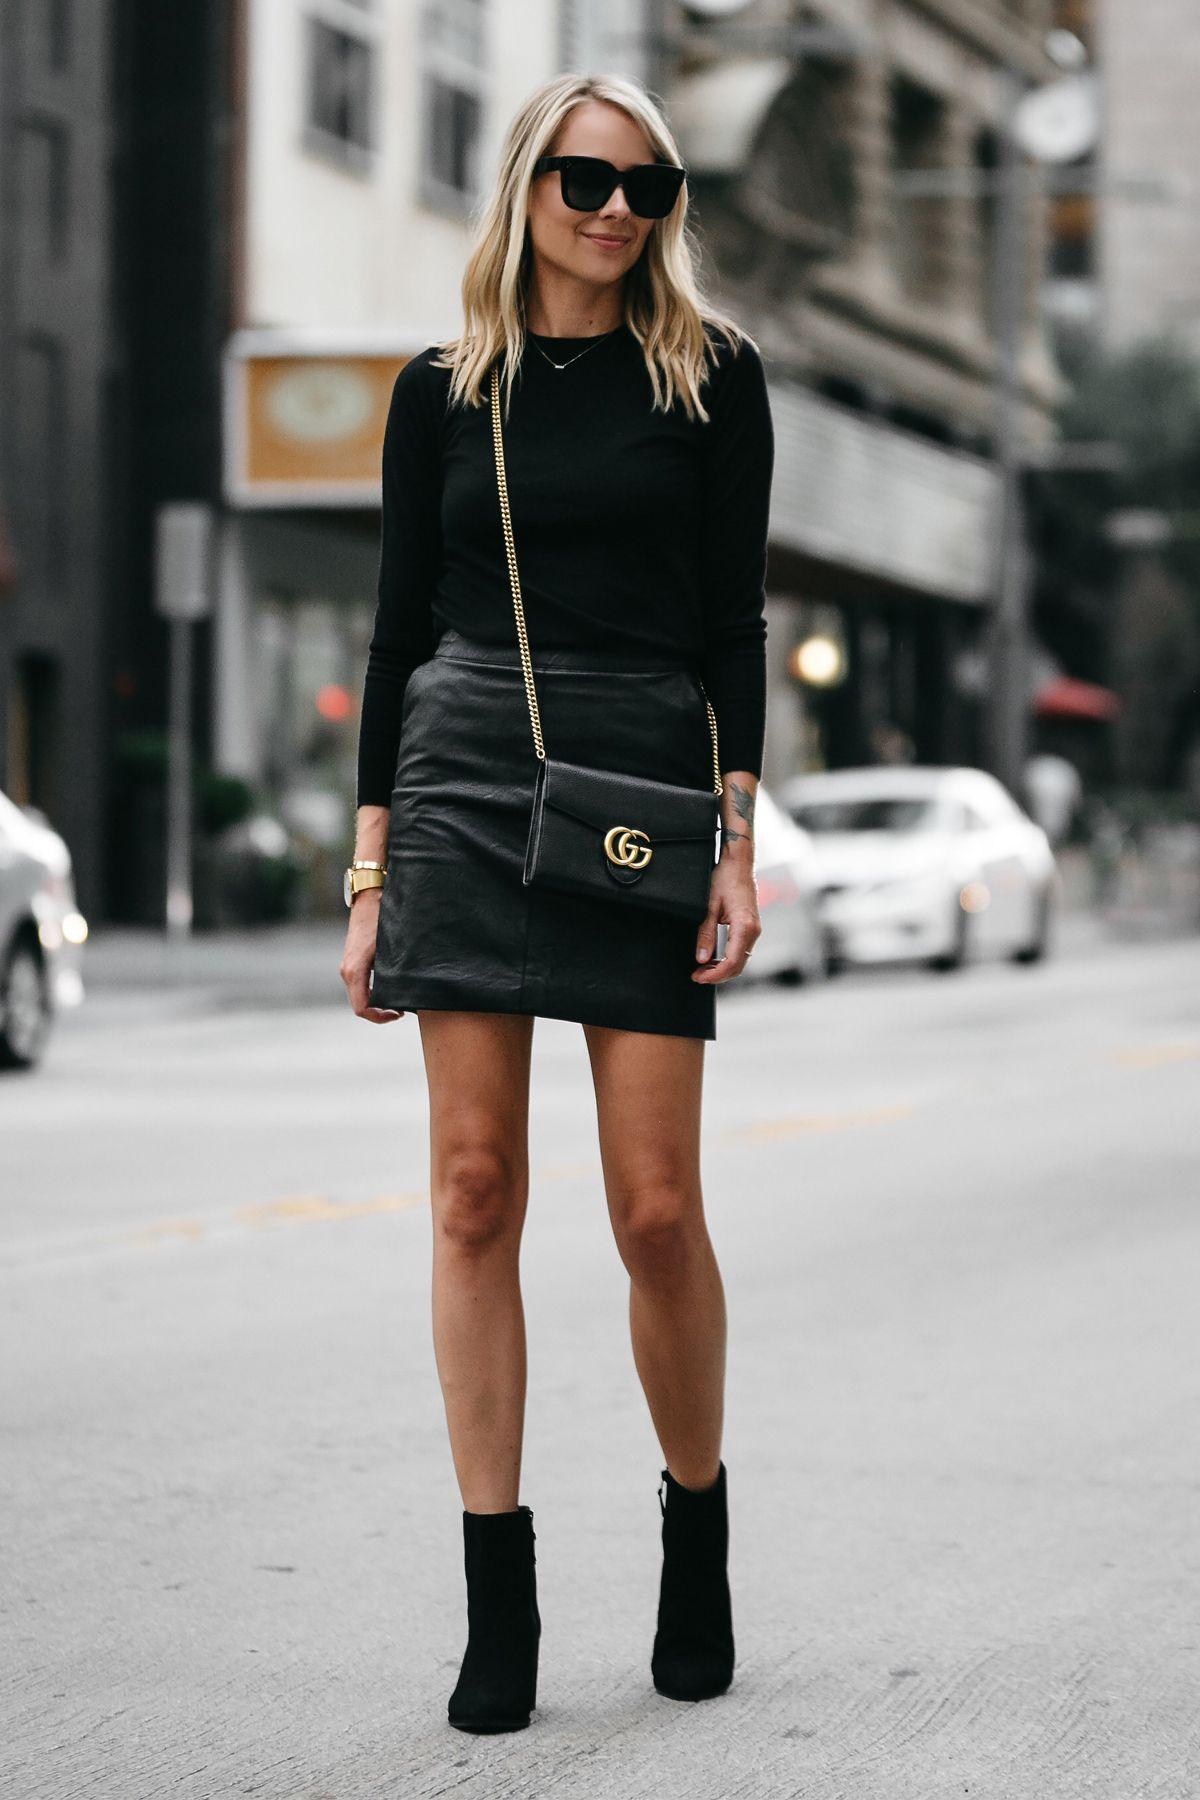 Blonde Woman Wearing Club Monaco Black Sweater Topshop Black Leather Mini  Skirt Outfit Gucci Marmont Handbag Stuart Weitzman Black Booties Fashion  Jackson ... 6e5928e79